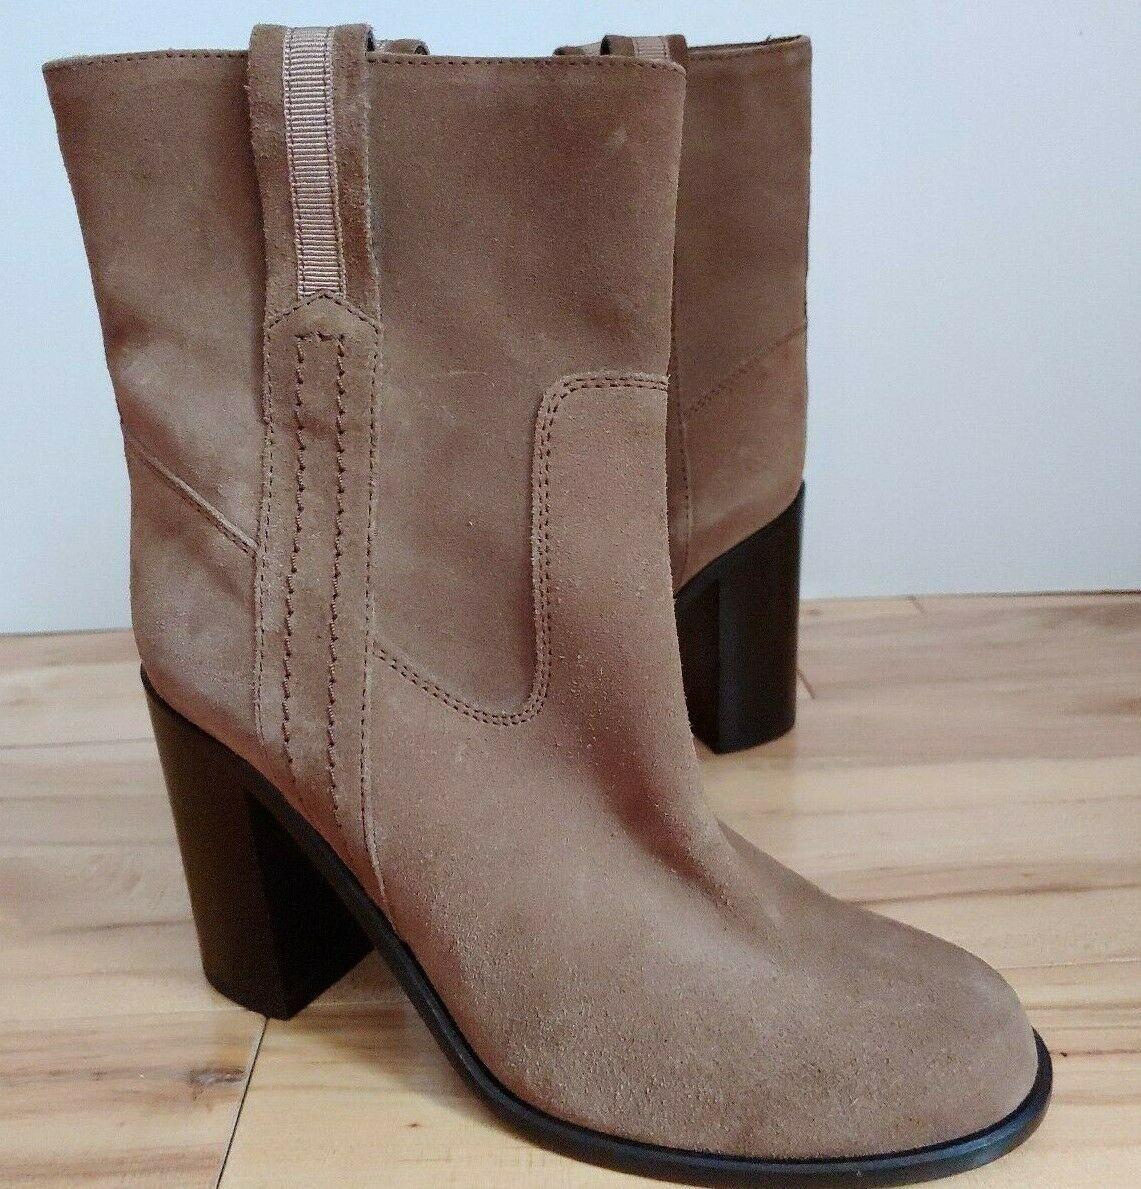 "Kate Spade New York Women's Suede Baise Boot mid calf sz 6M tan tobacco 3.5""Heel - $94.32"